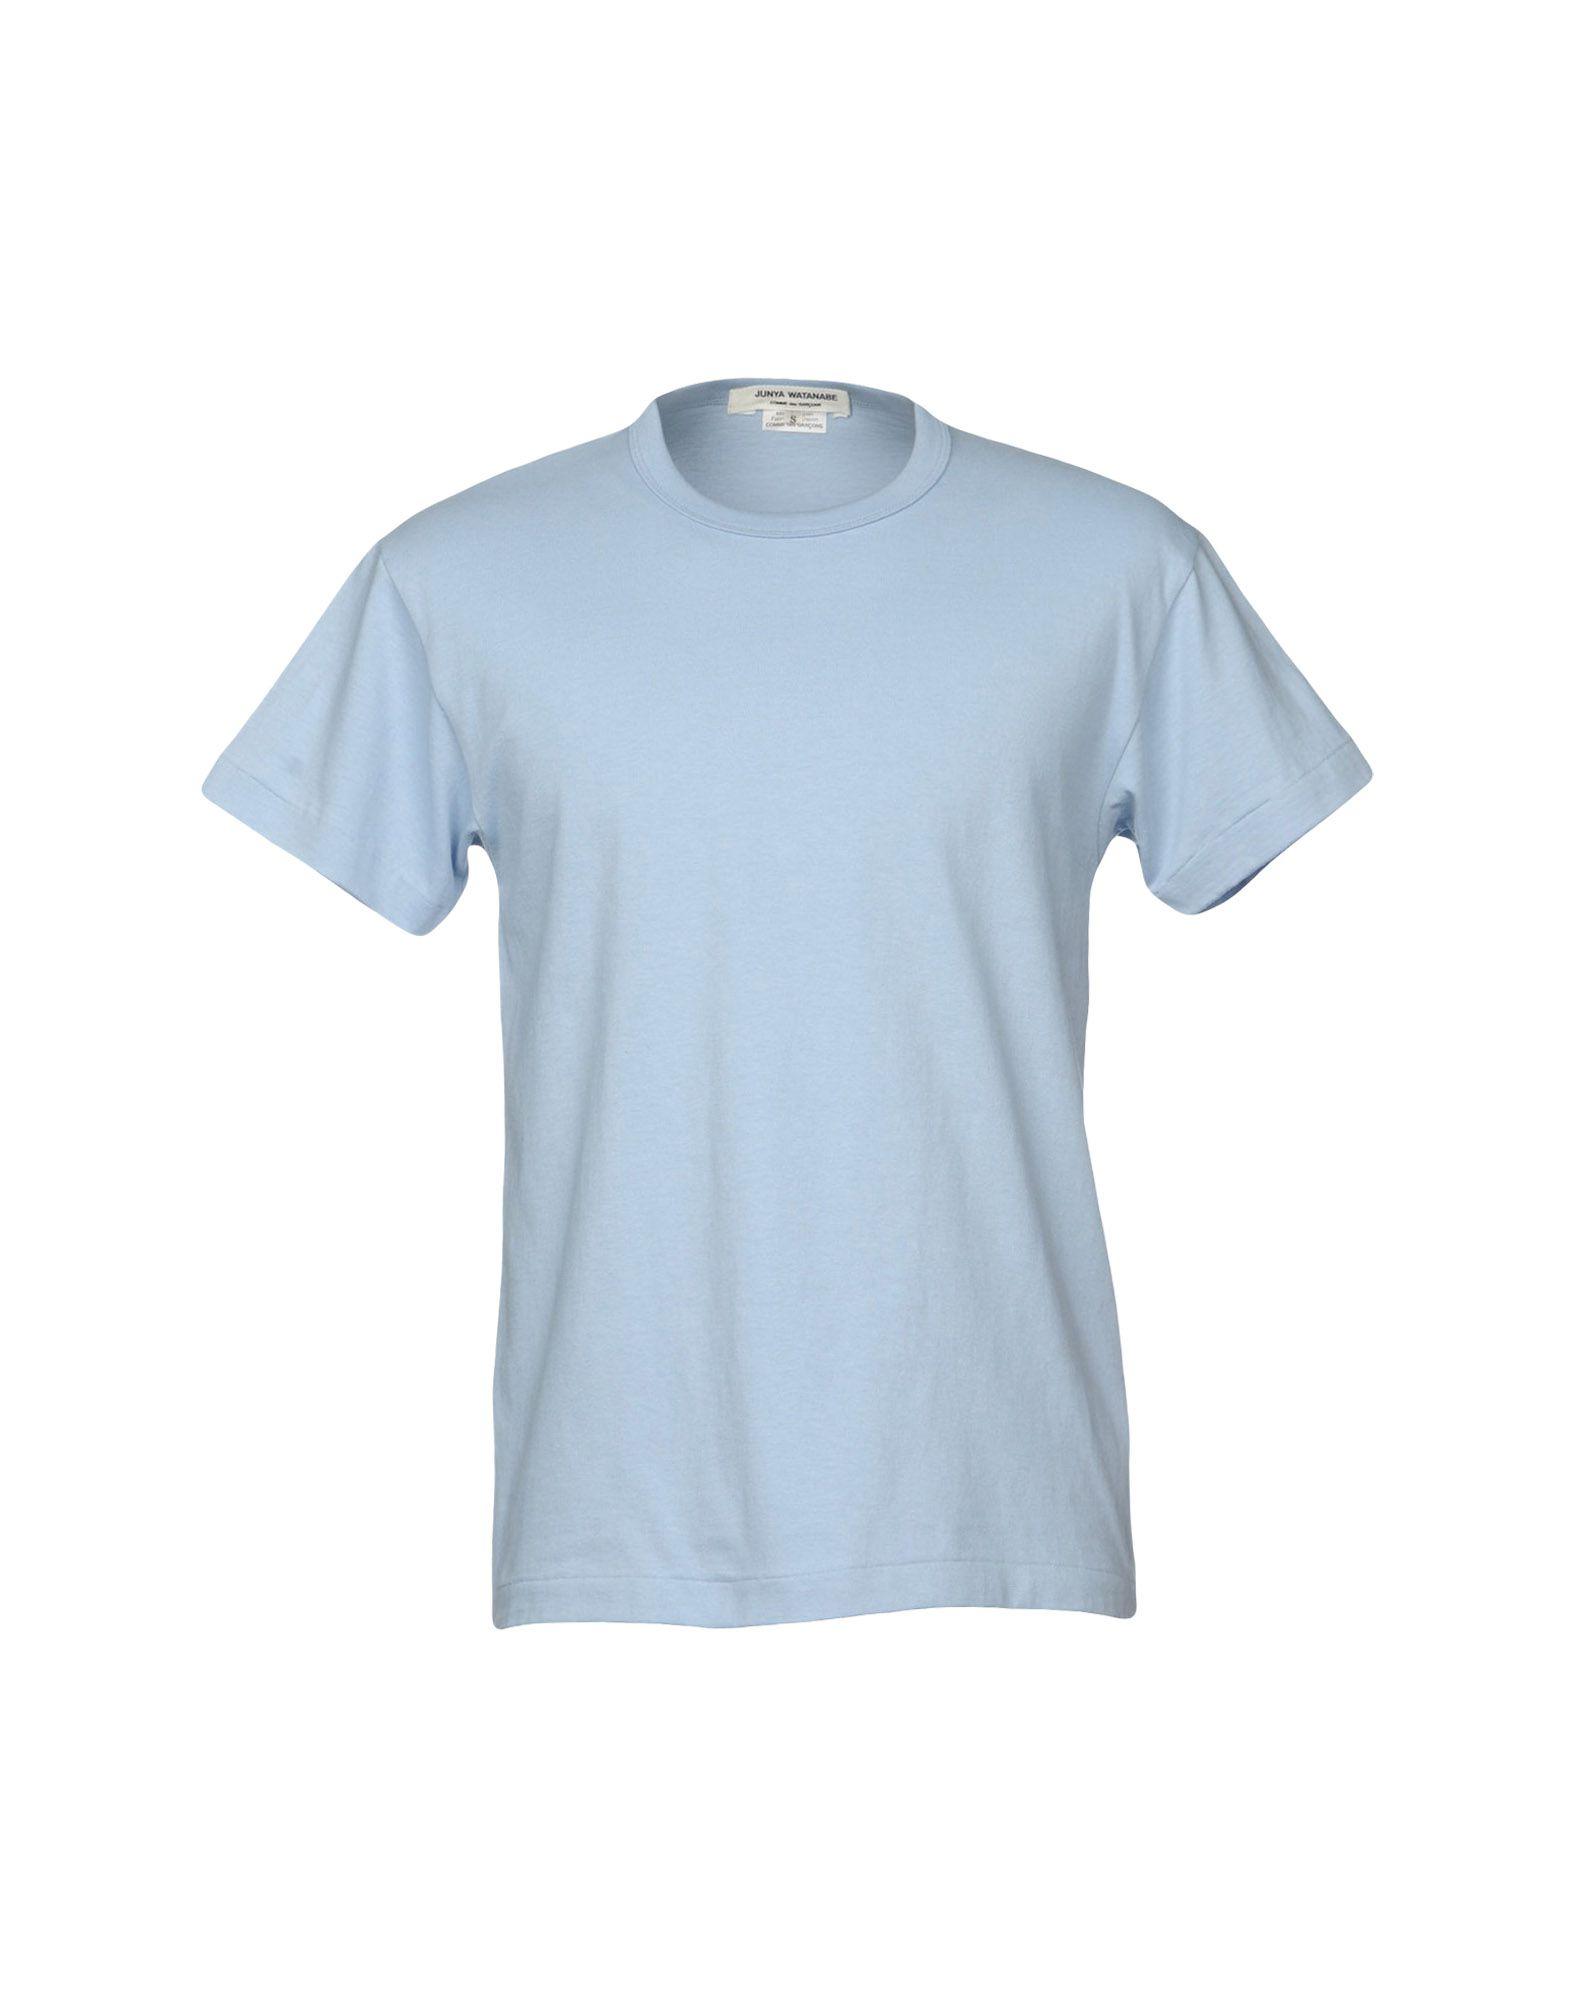 T-Shirt Junya Watanabe Comme Des Garçons Uomo - Acquista online su